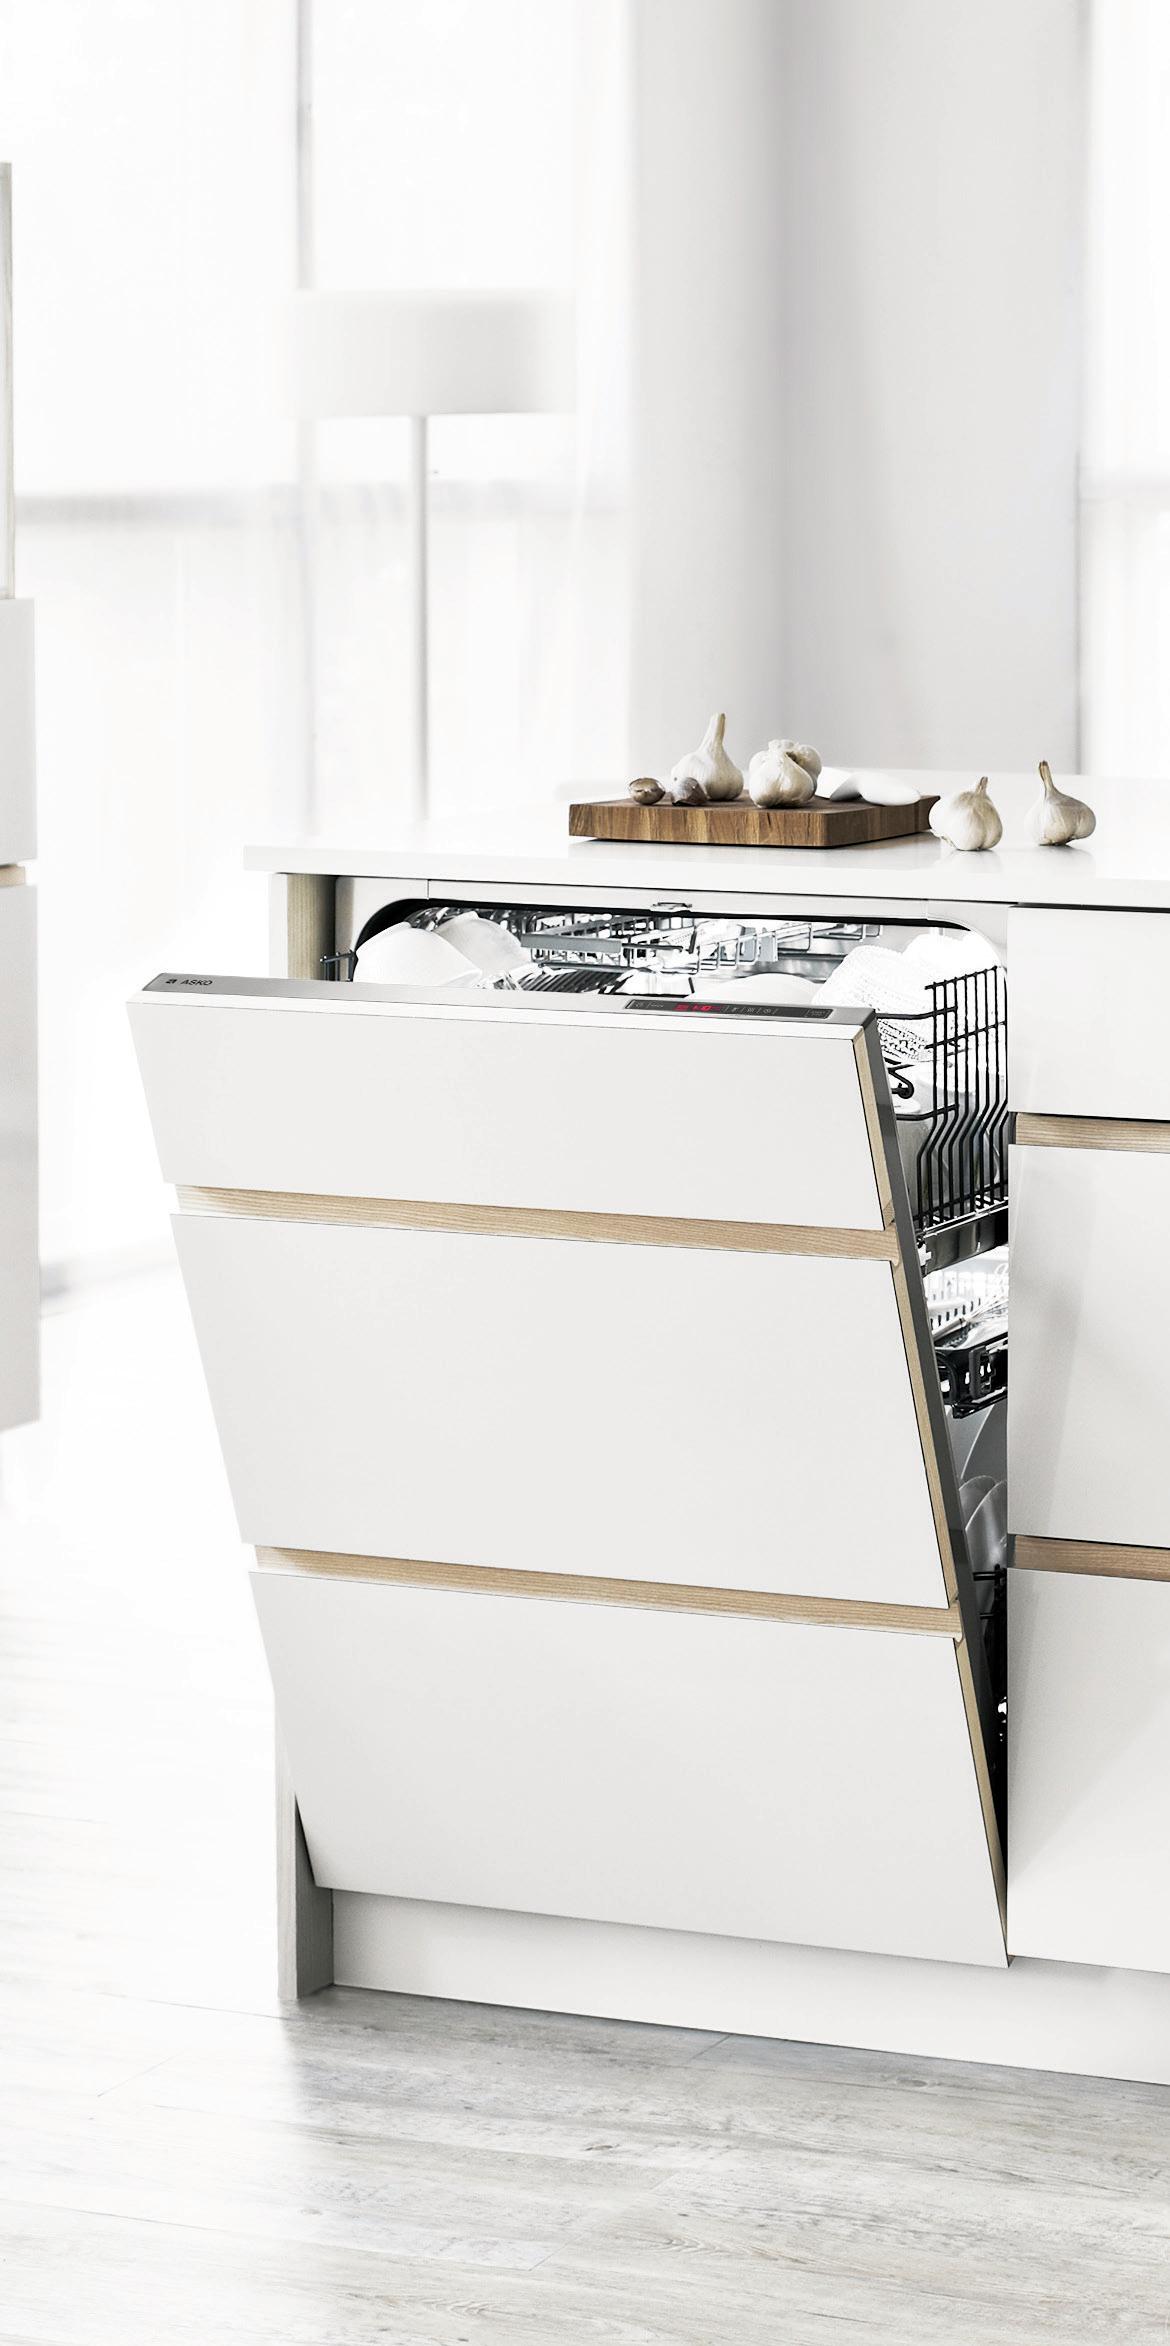 Hidden Cabinet Dishwasher Discrete Design Allows For Functionality To Perfection Meet In This Minimalist Tranquil Kitchen Dis Hidden Cabinet Hafele Kitchen